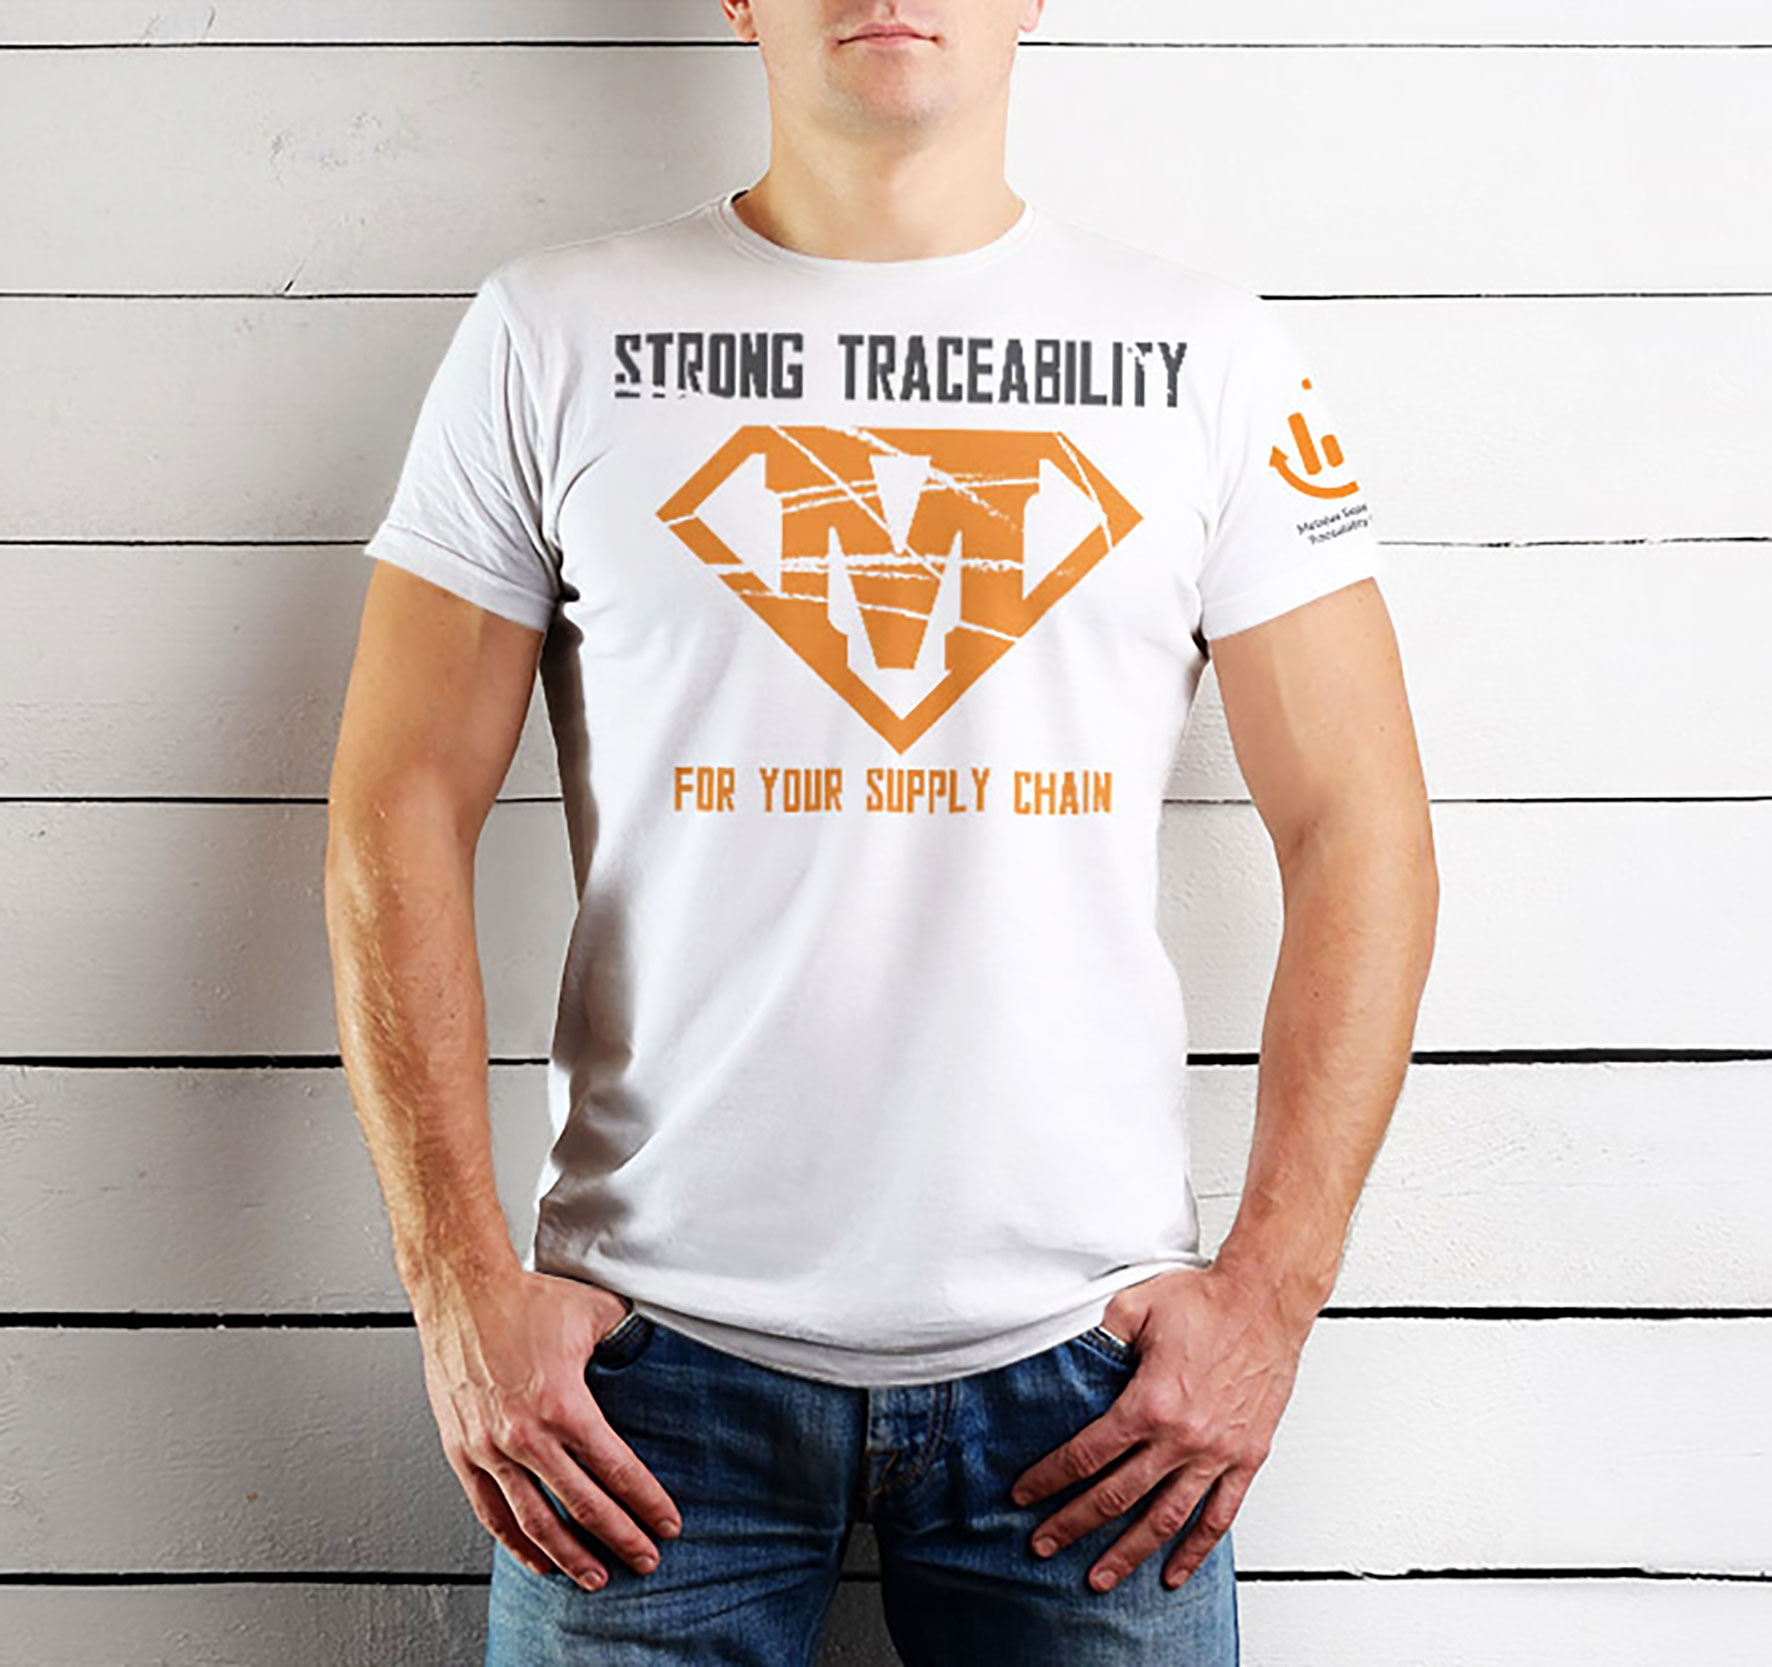 Marketing t-shirt design